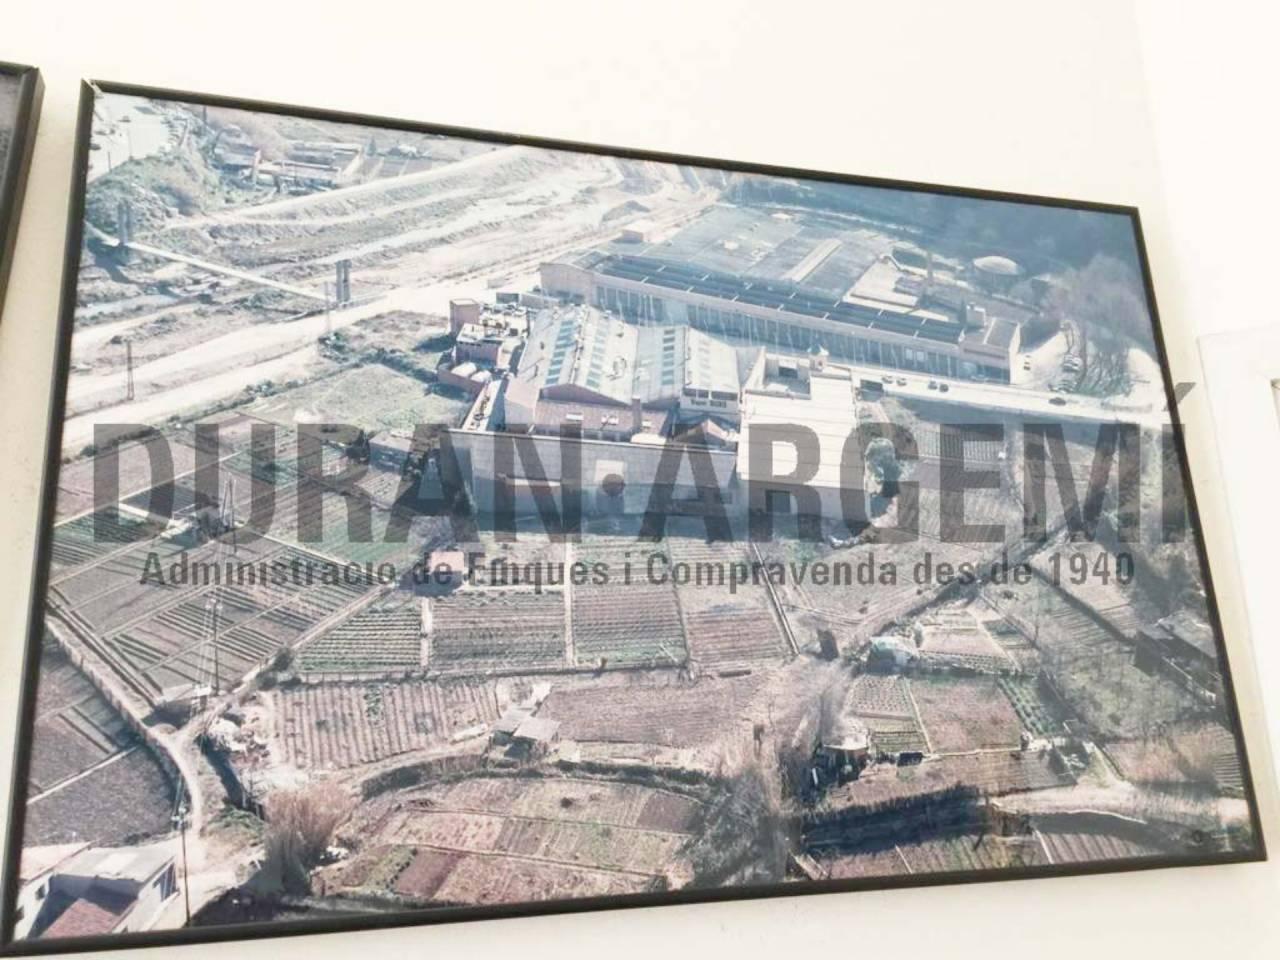 Terreno en venta en Torre-romeu